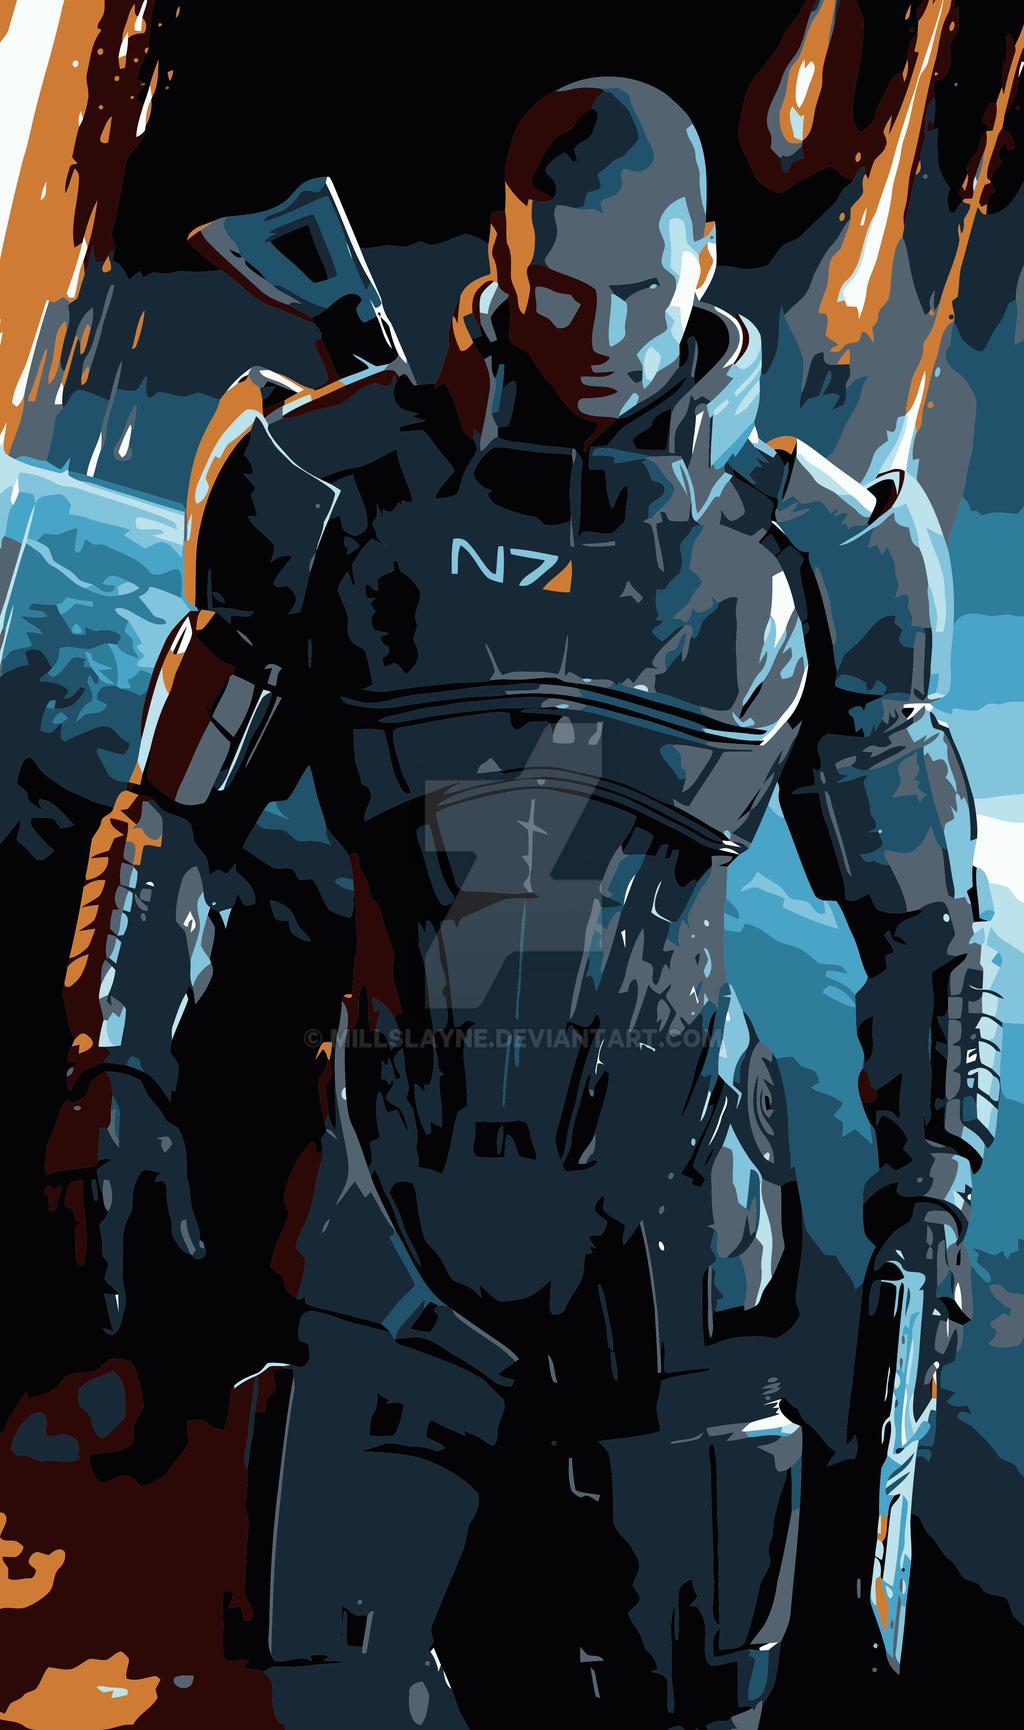 Commander Shepard Mass Effect 3 By Millslayne On Deviantart